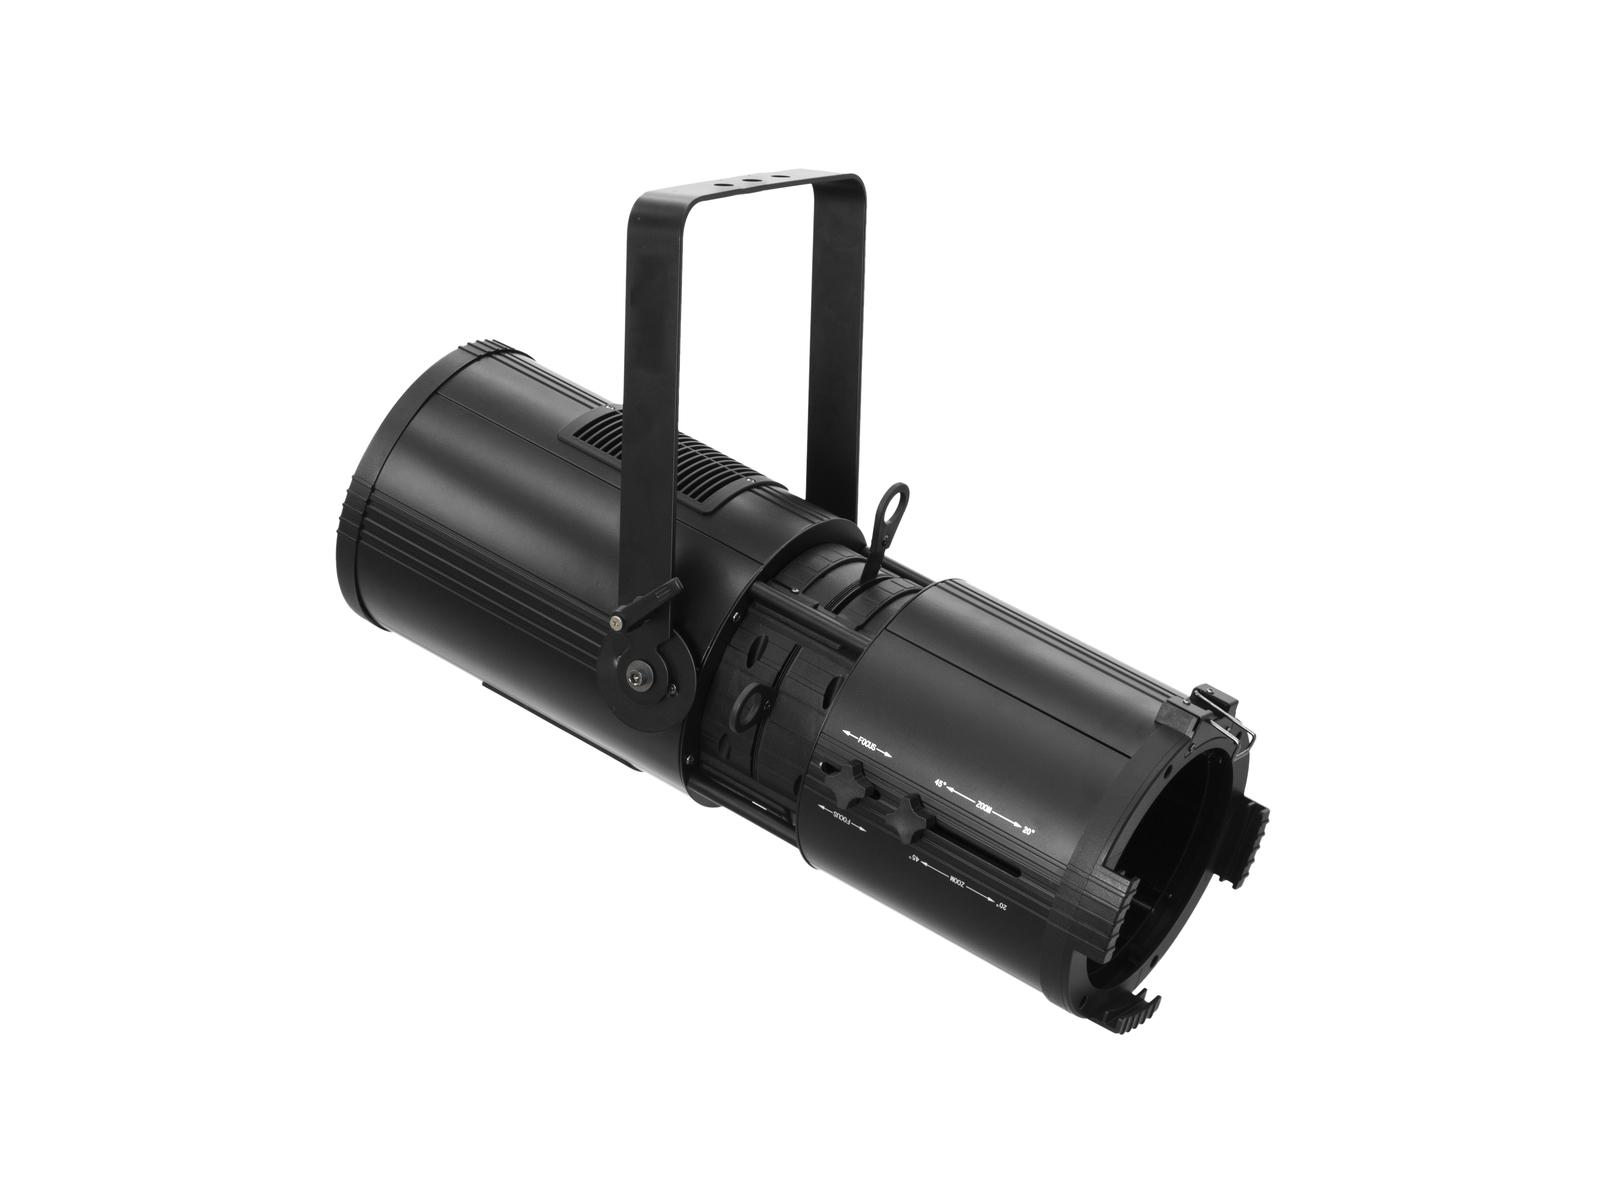 Futurelight Profile 200, LED profilový reflektor, 200W COB, 20-45